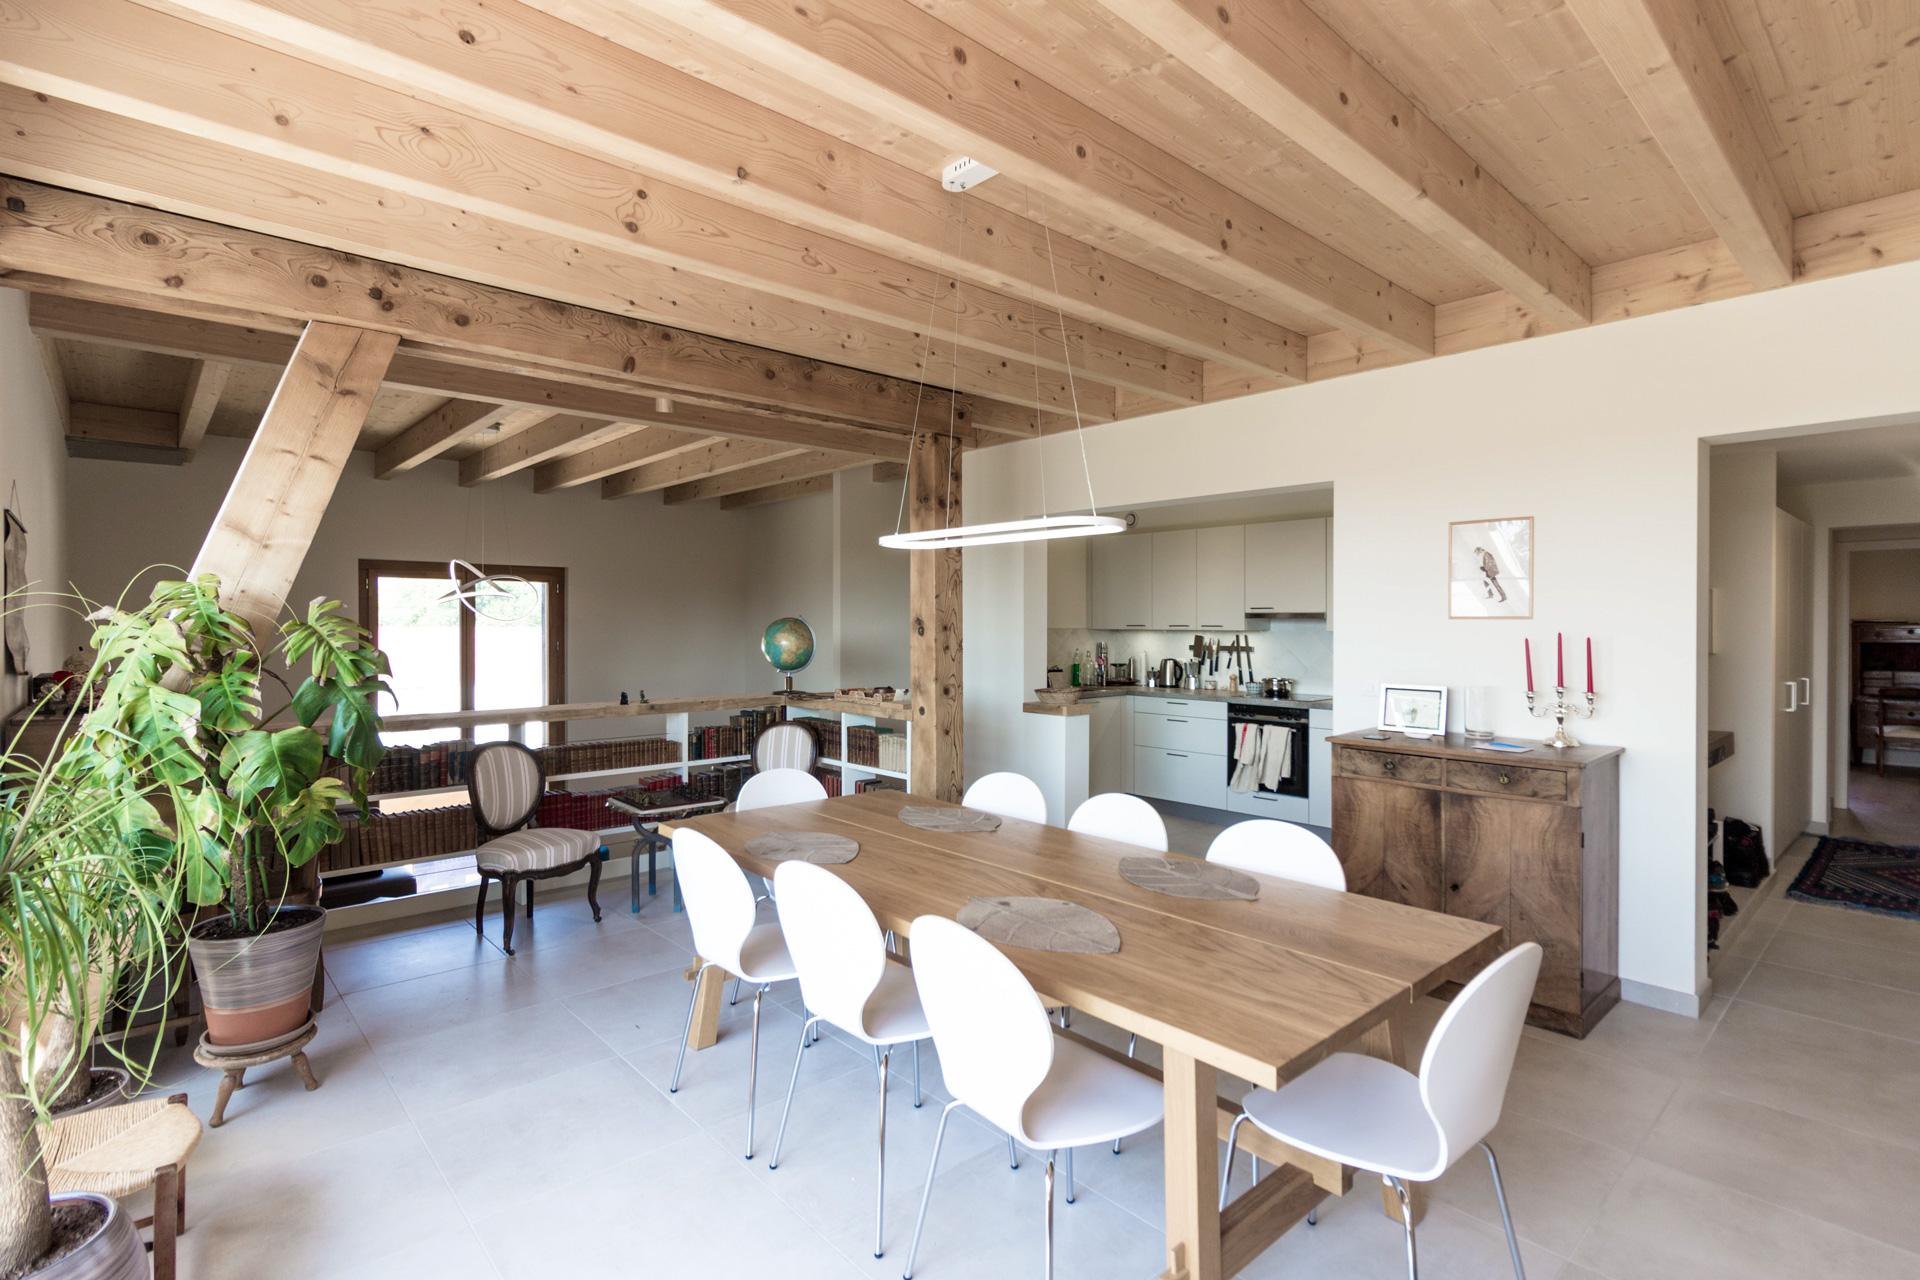 Apartment renovation : Dining room